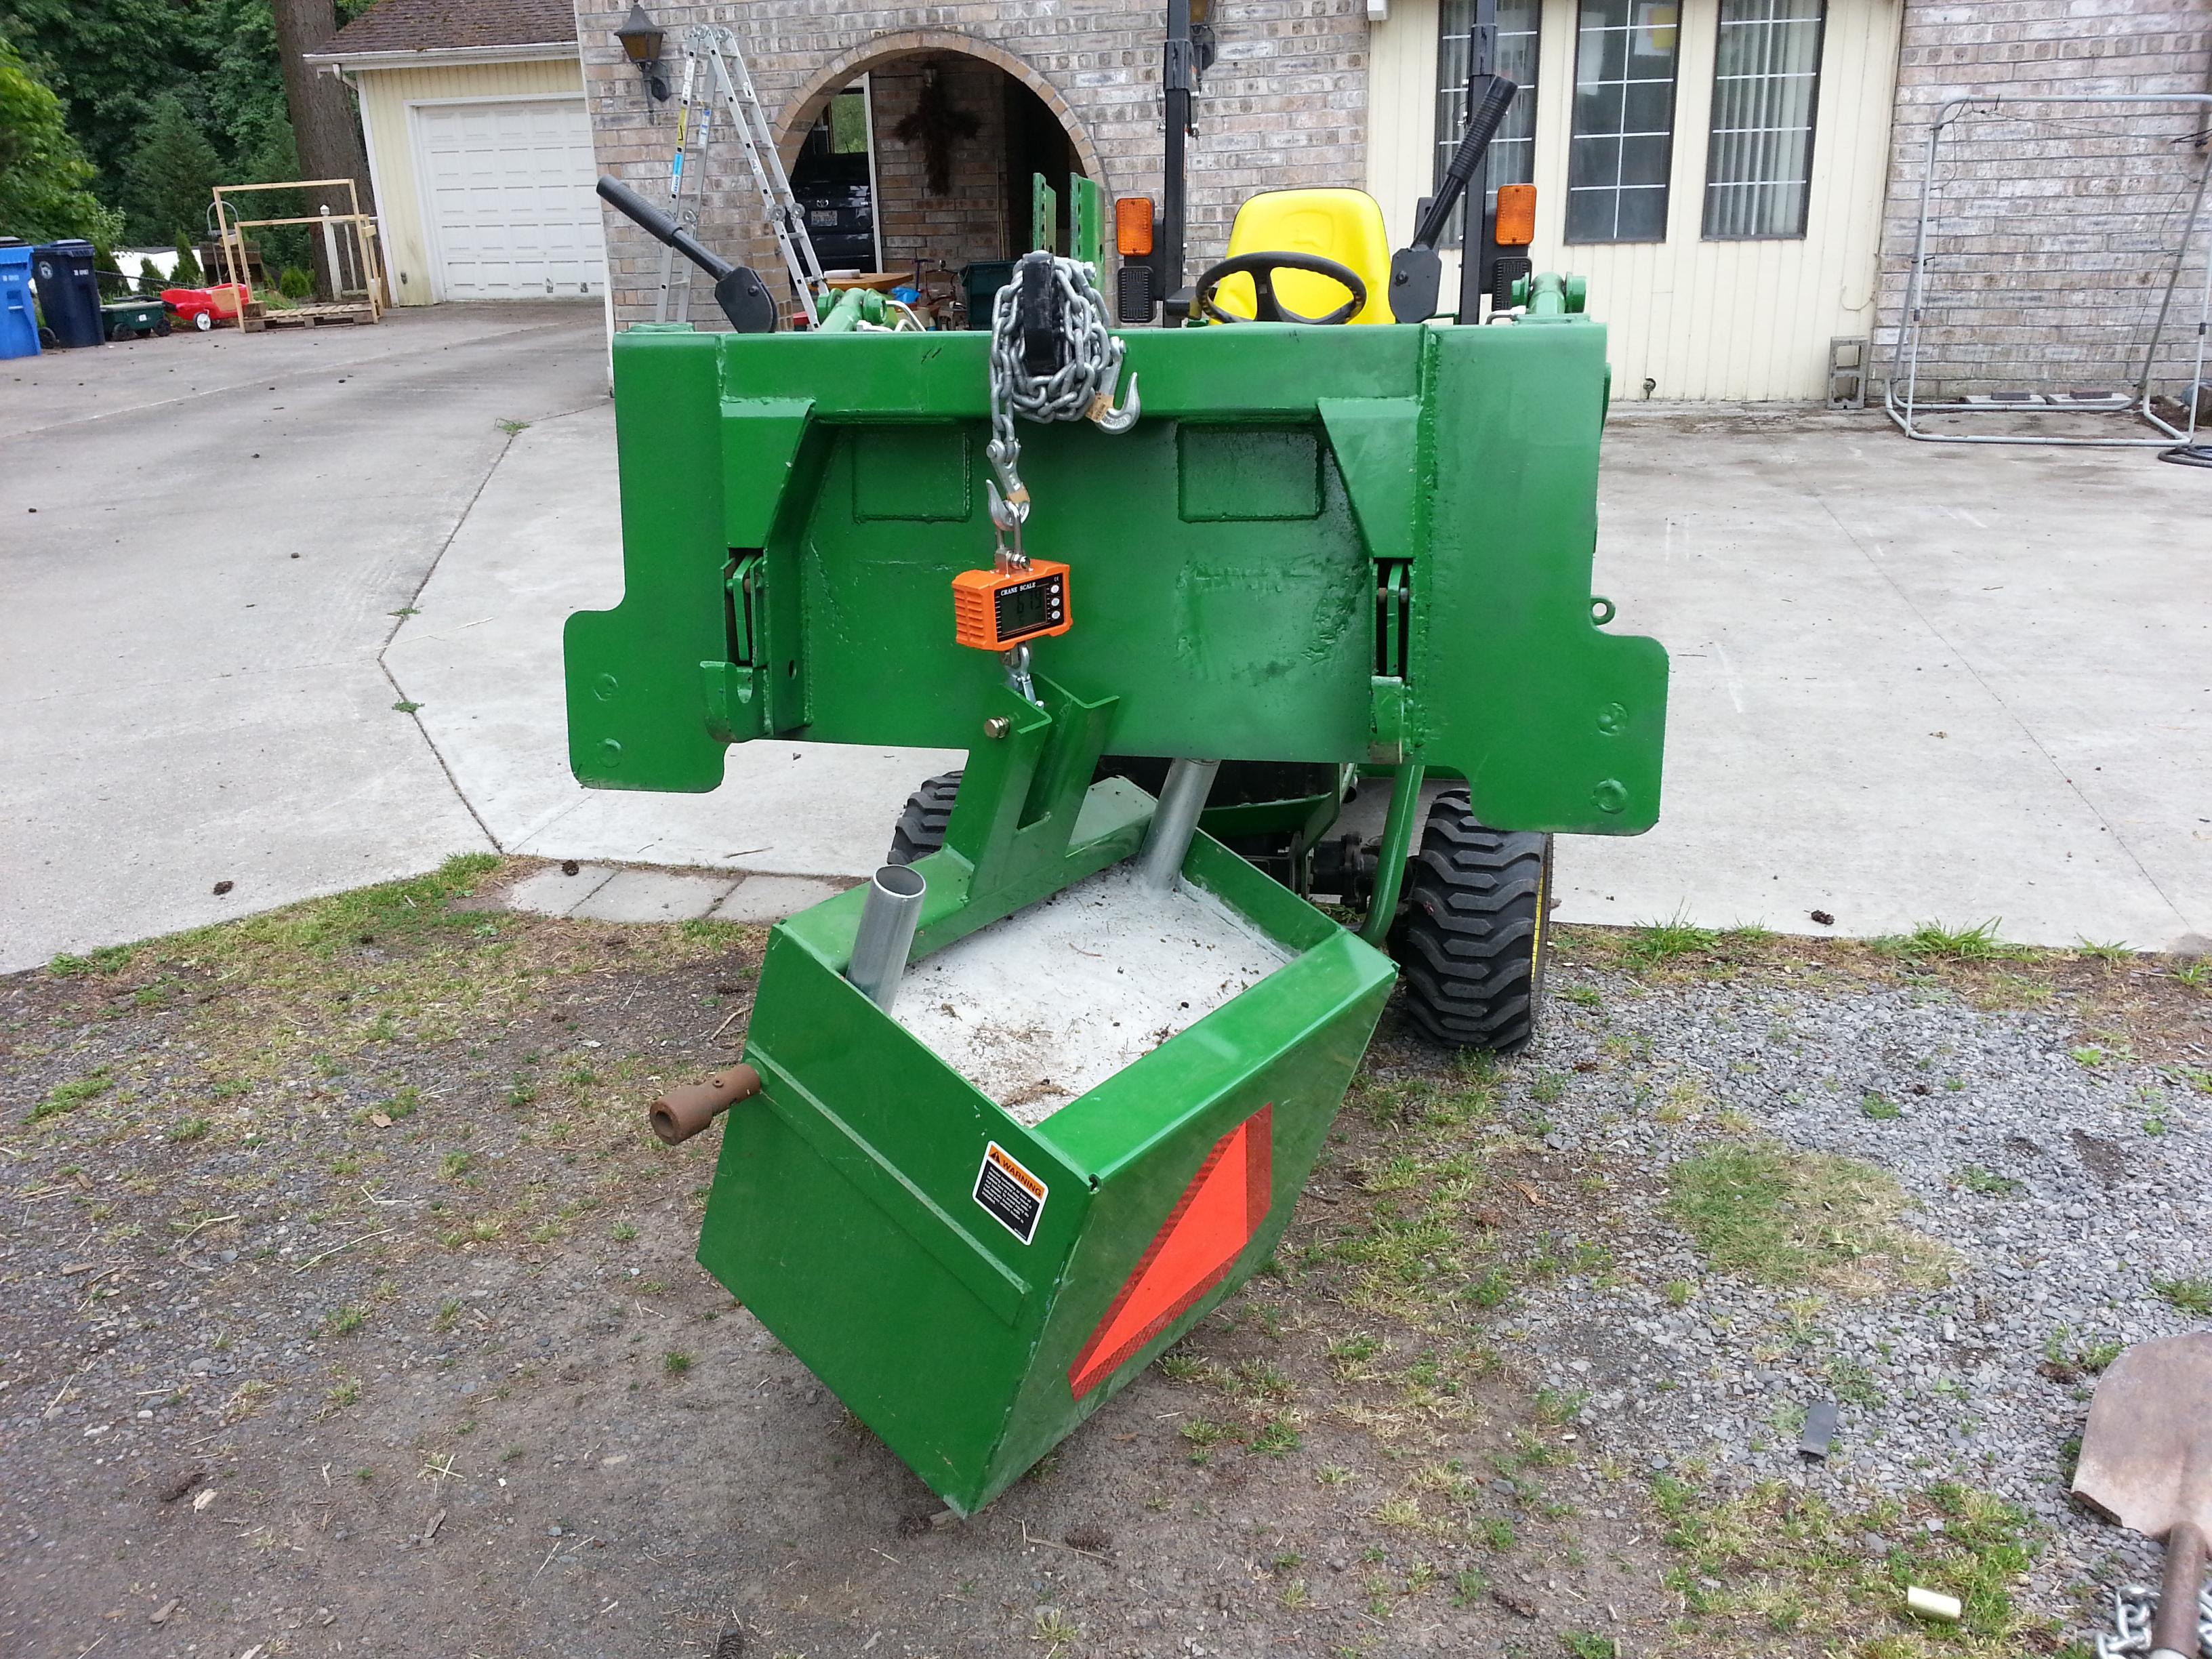 Tractor Ballast Box : Ballast box weight in at lb